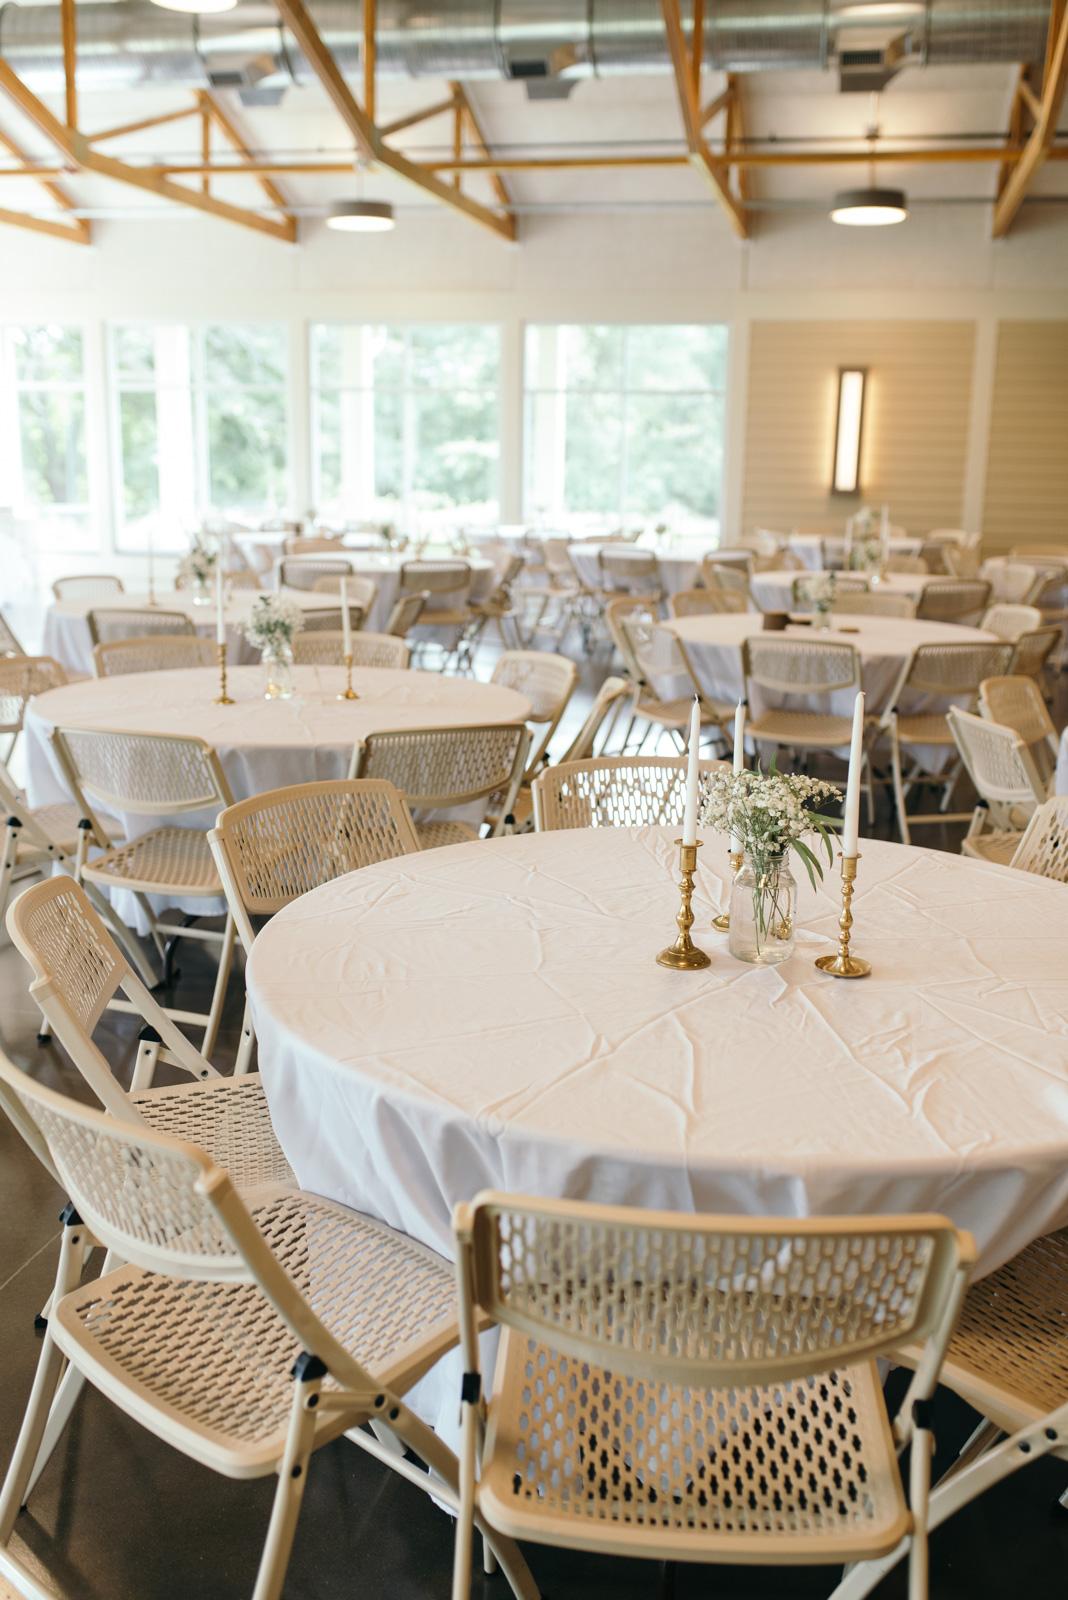 Ushers Ferry Historic Village Wedding Reception tables